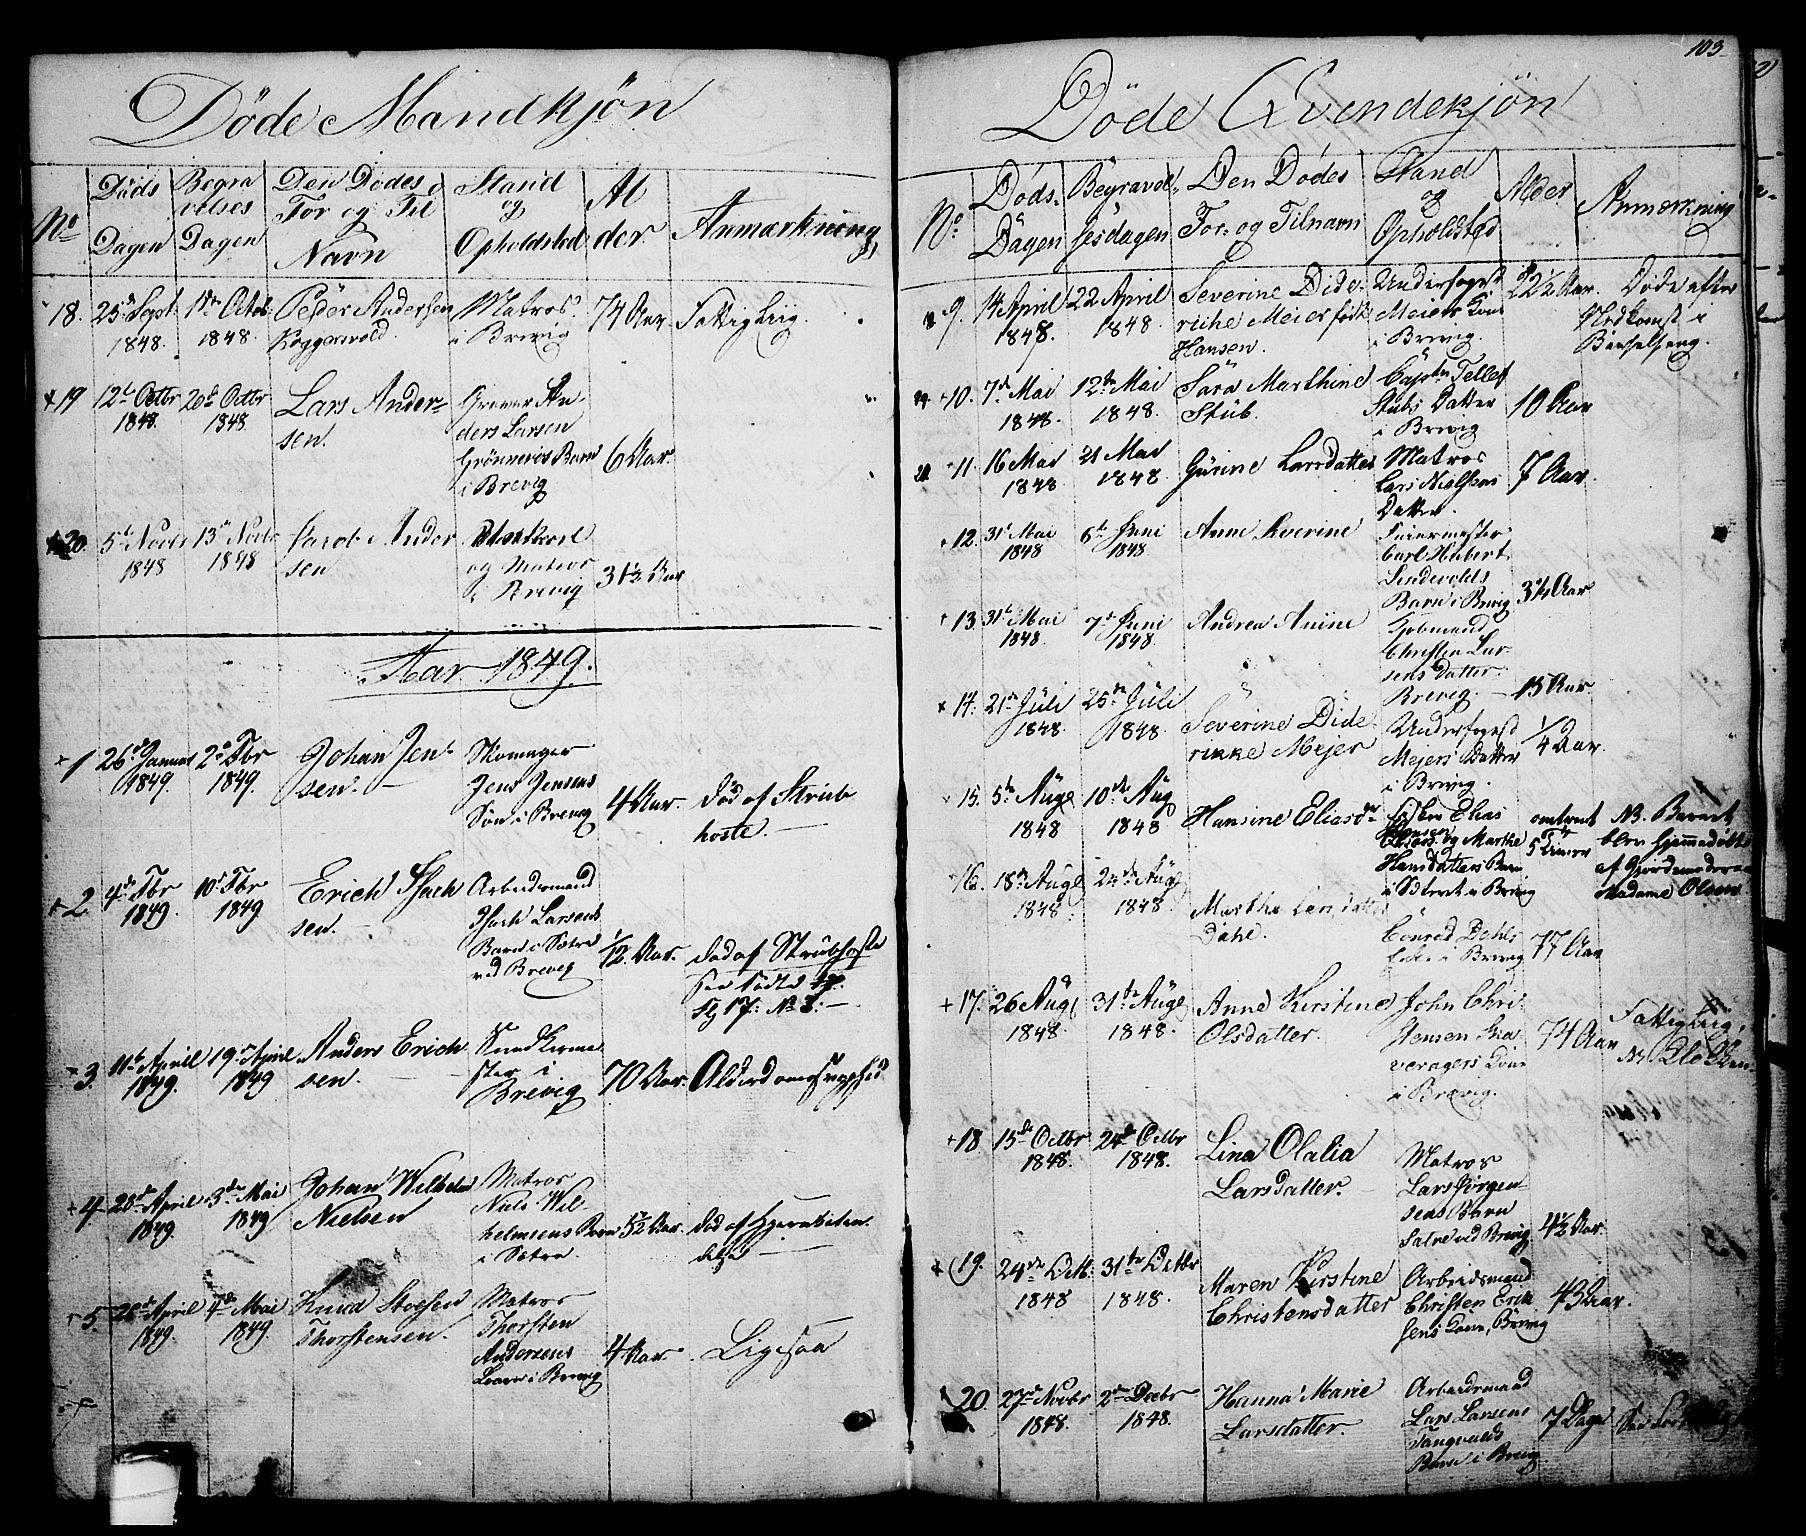 SAKO, Brevik kirkebøker, G/Ga/L0002: Klokkerbok nr. 2, 1846-1865, s. 103